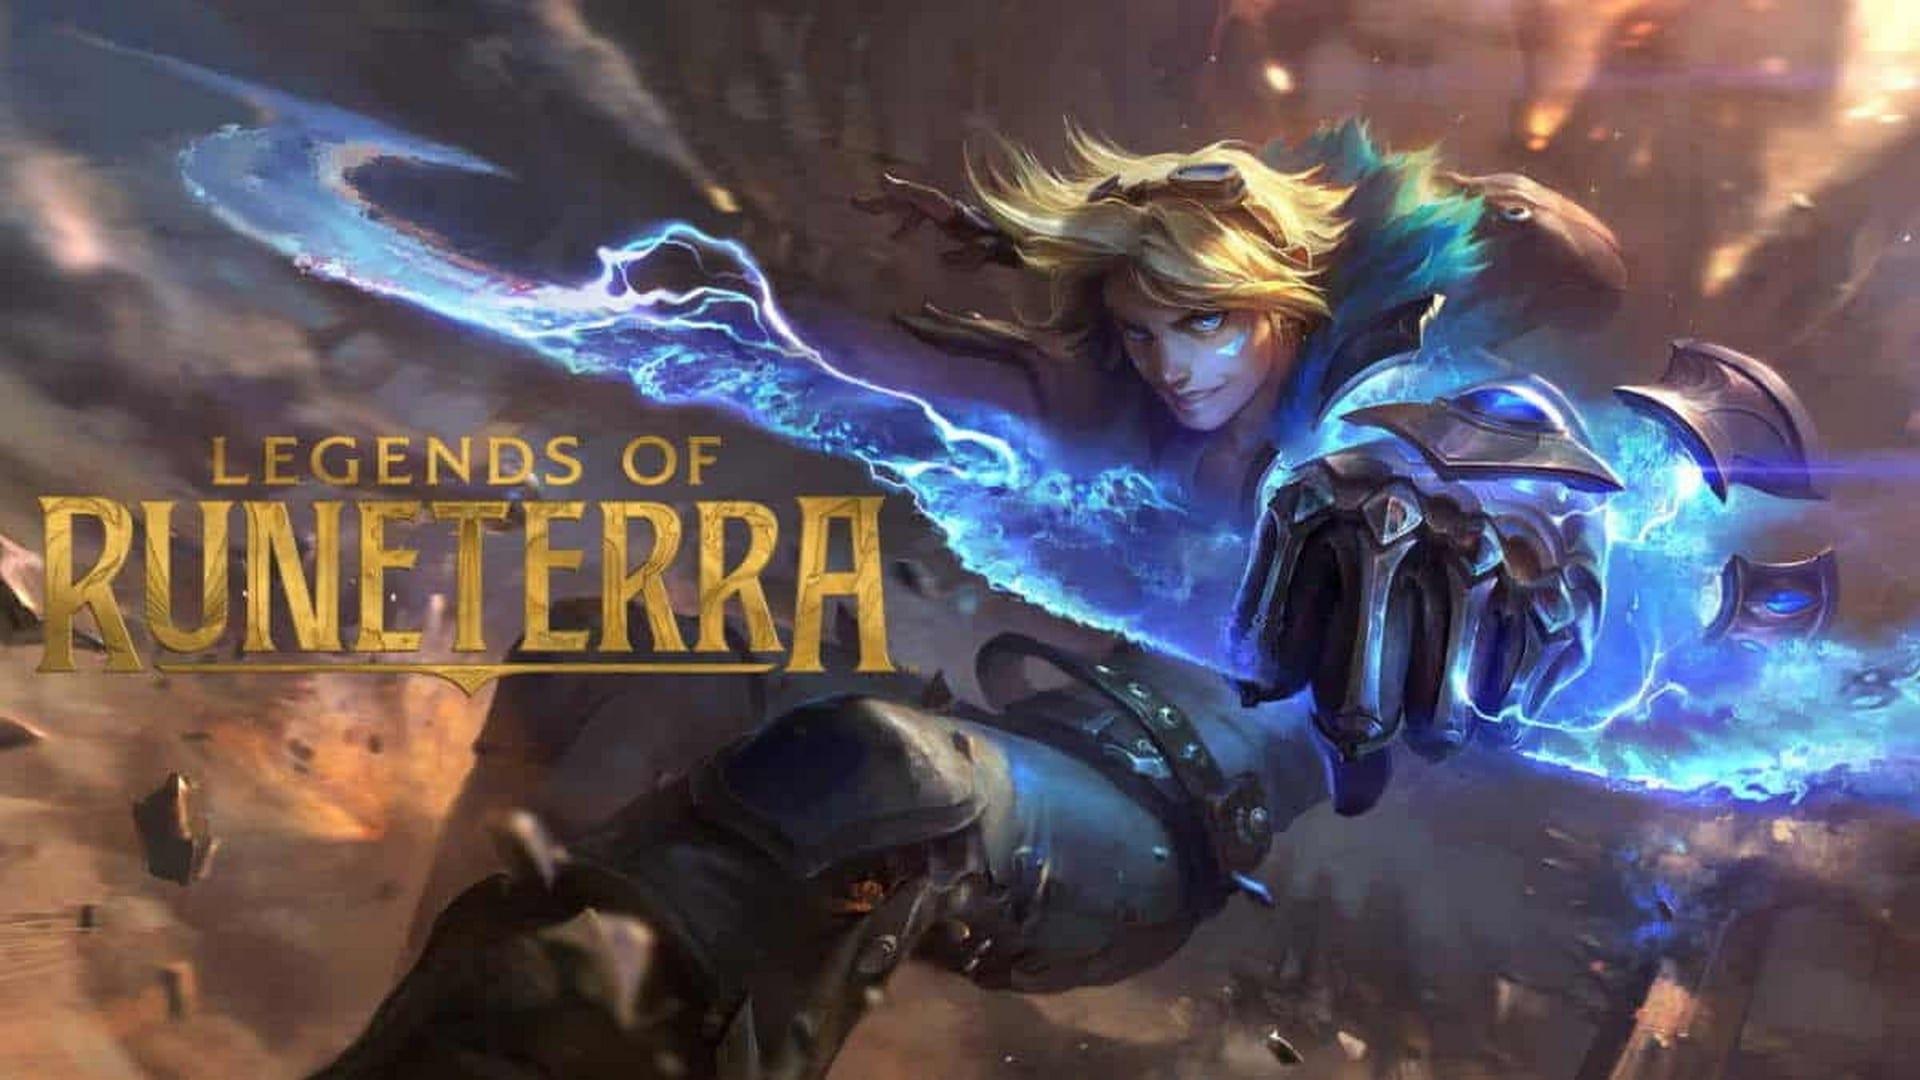 Legends of Runeterra Open Beta Begins Friday 24th Jan – Open To The Public Sat 25th